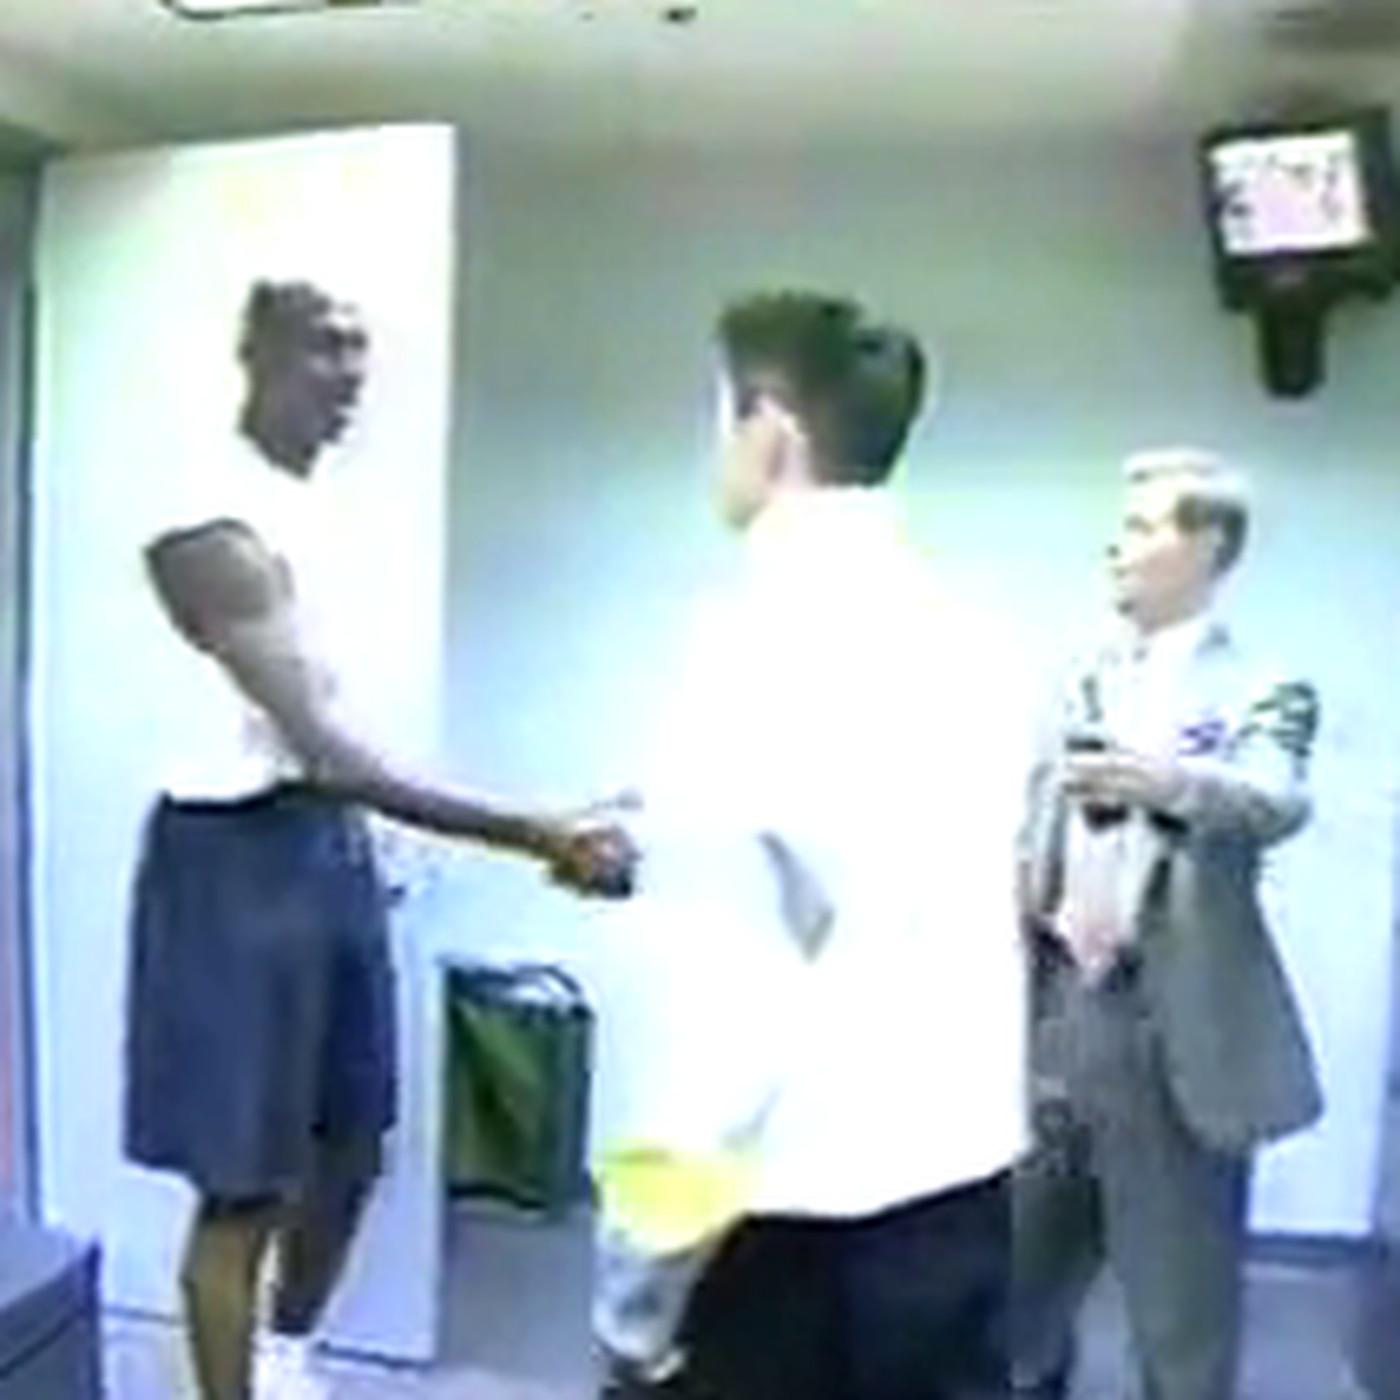 20 Years Ago This Week A Baby Faced Turtleneck Wearing Ichiro Young Red Suzuki Met Michael Jordan